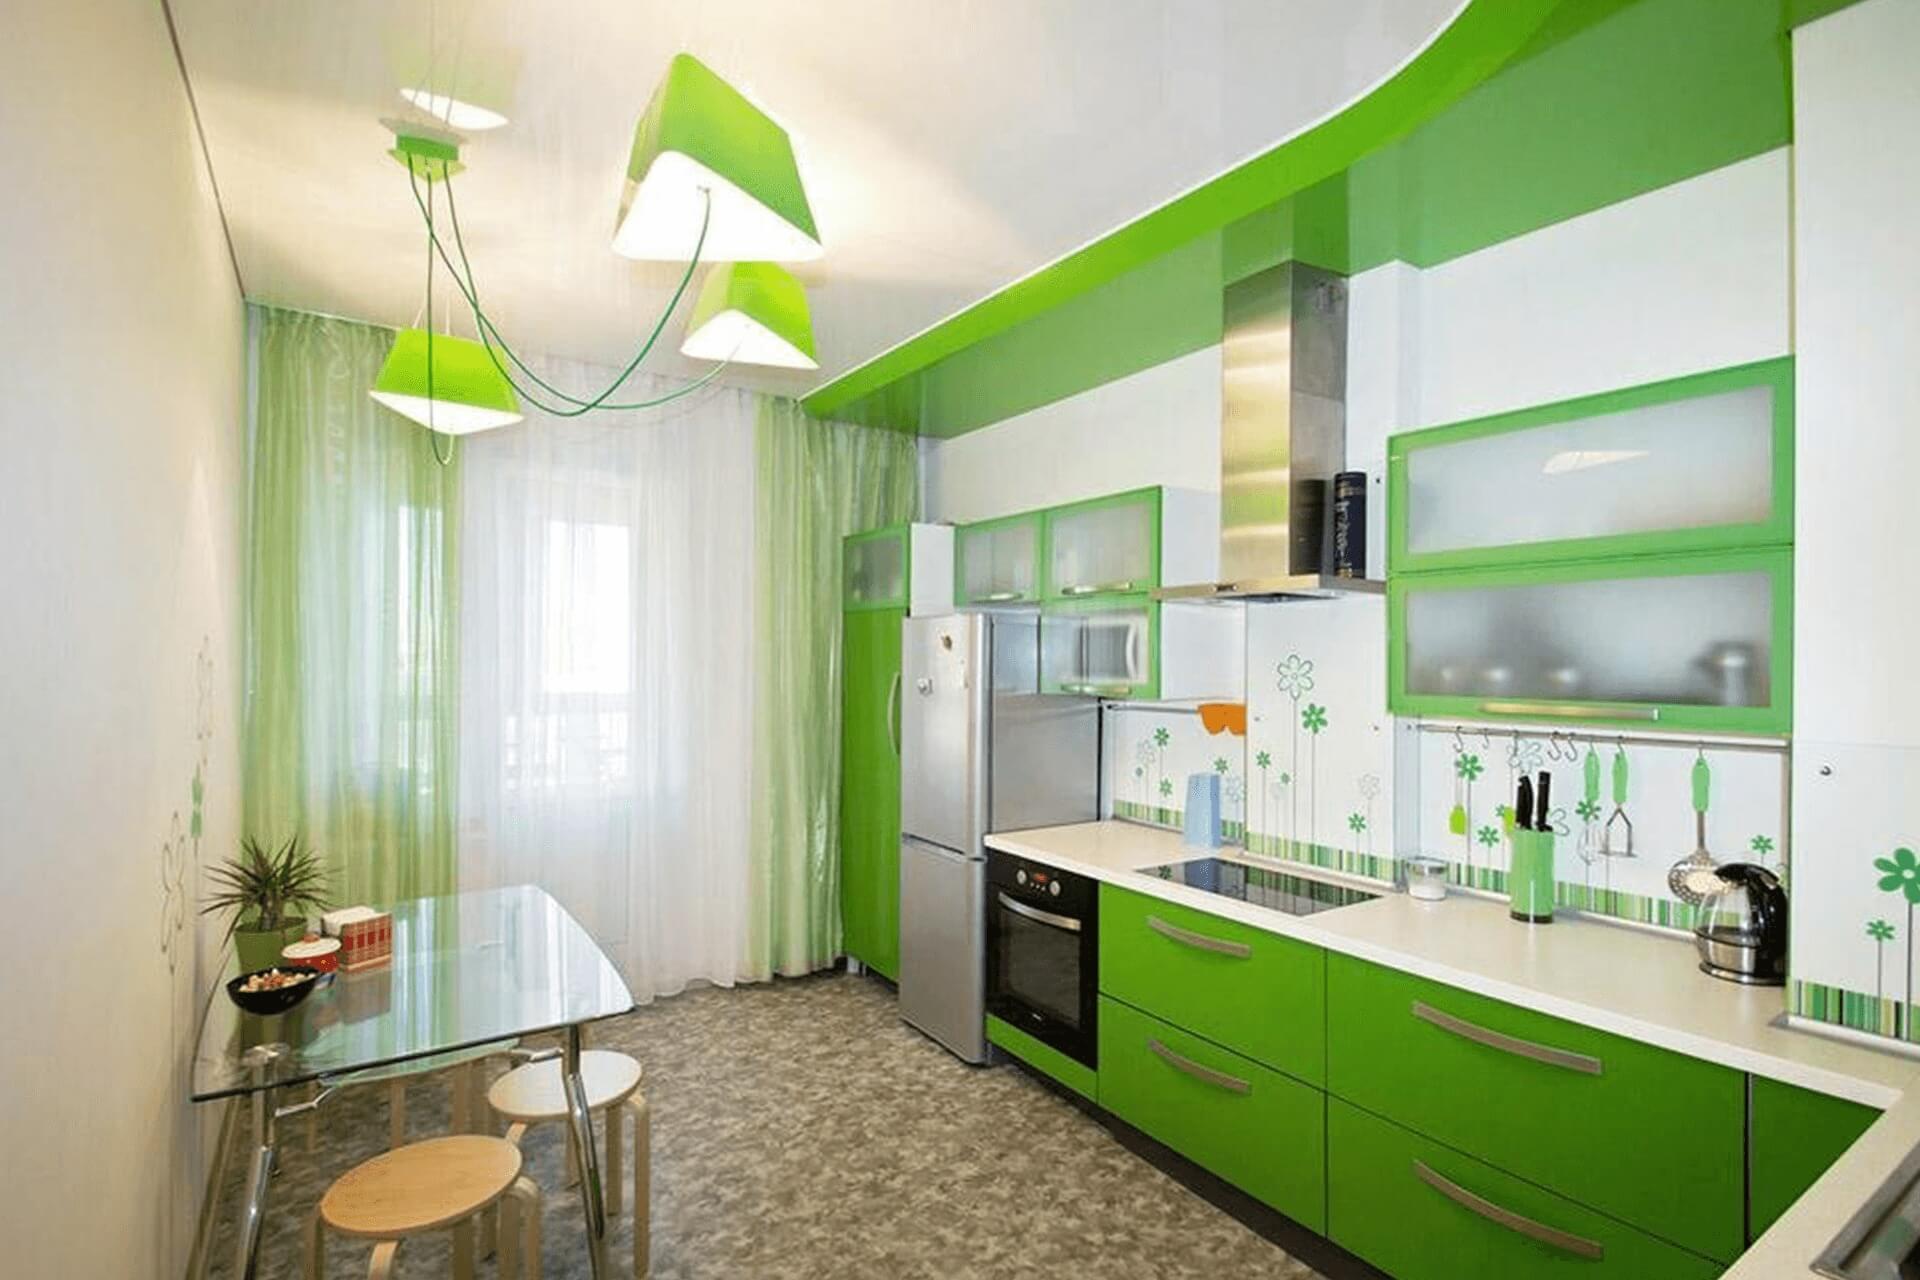 бело зелёный потолок